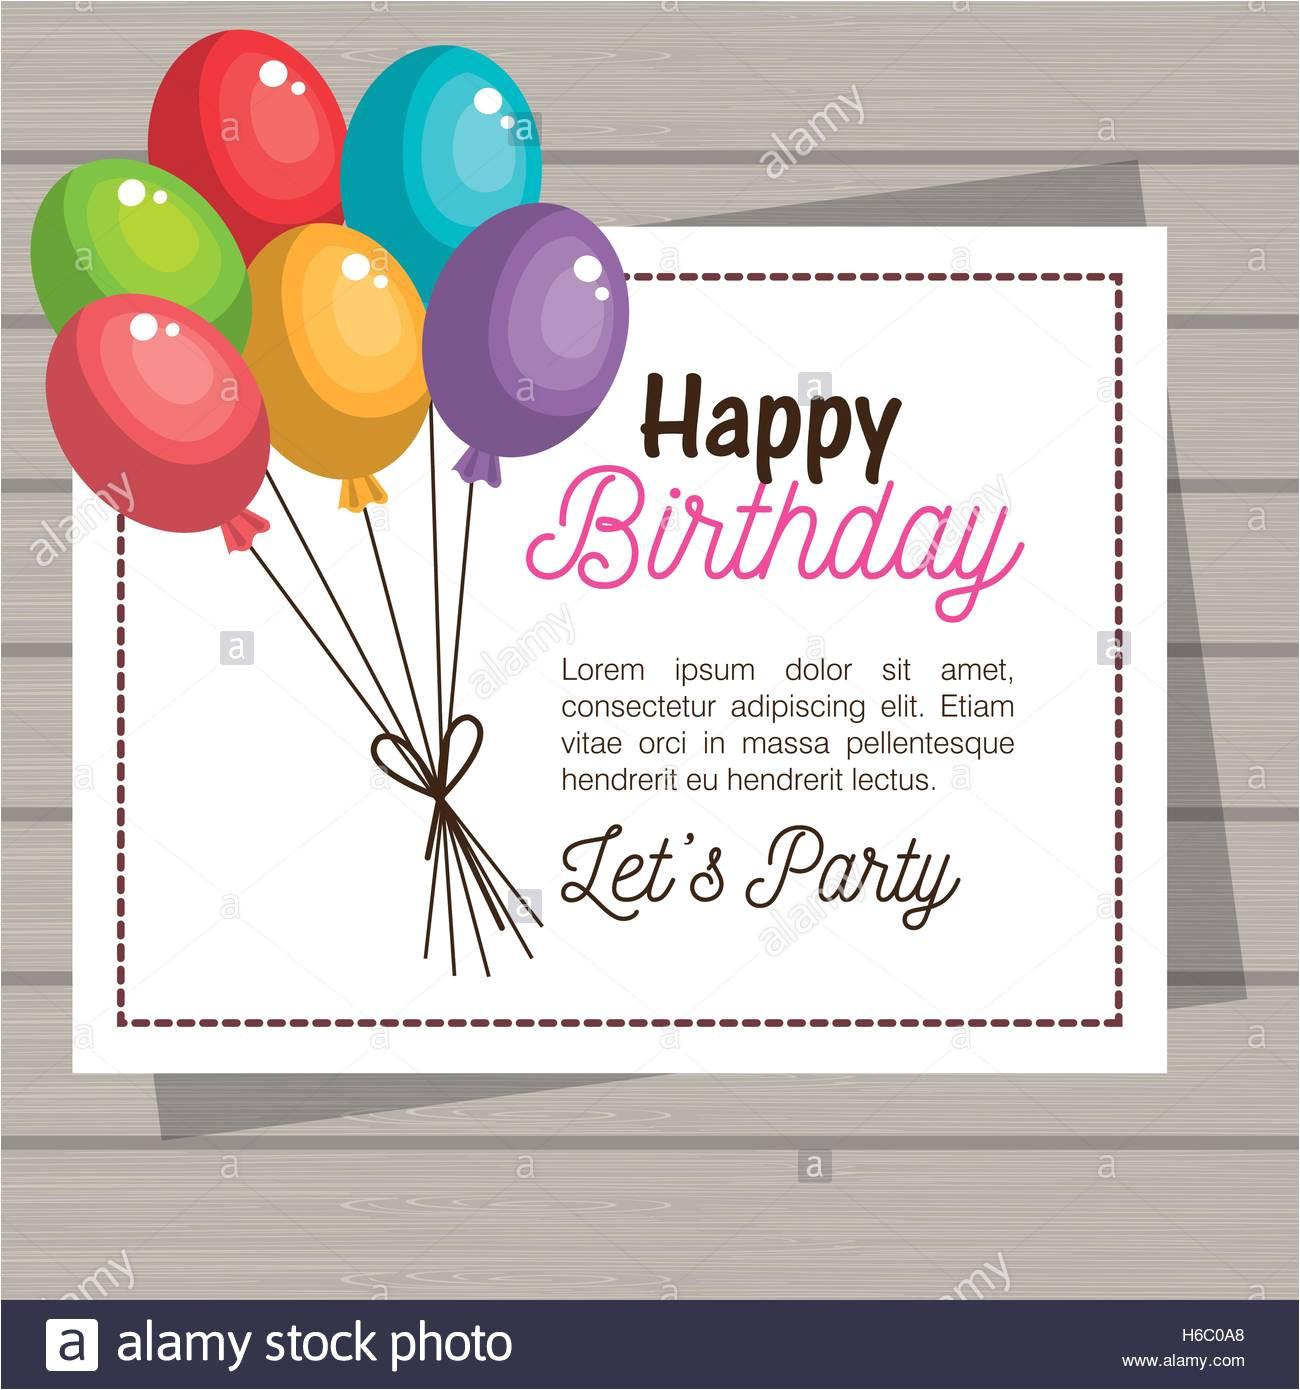 happy birthday invitation card h6c0a8 jpg